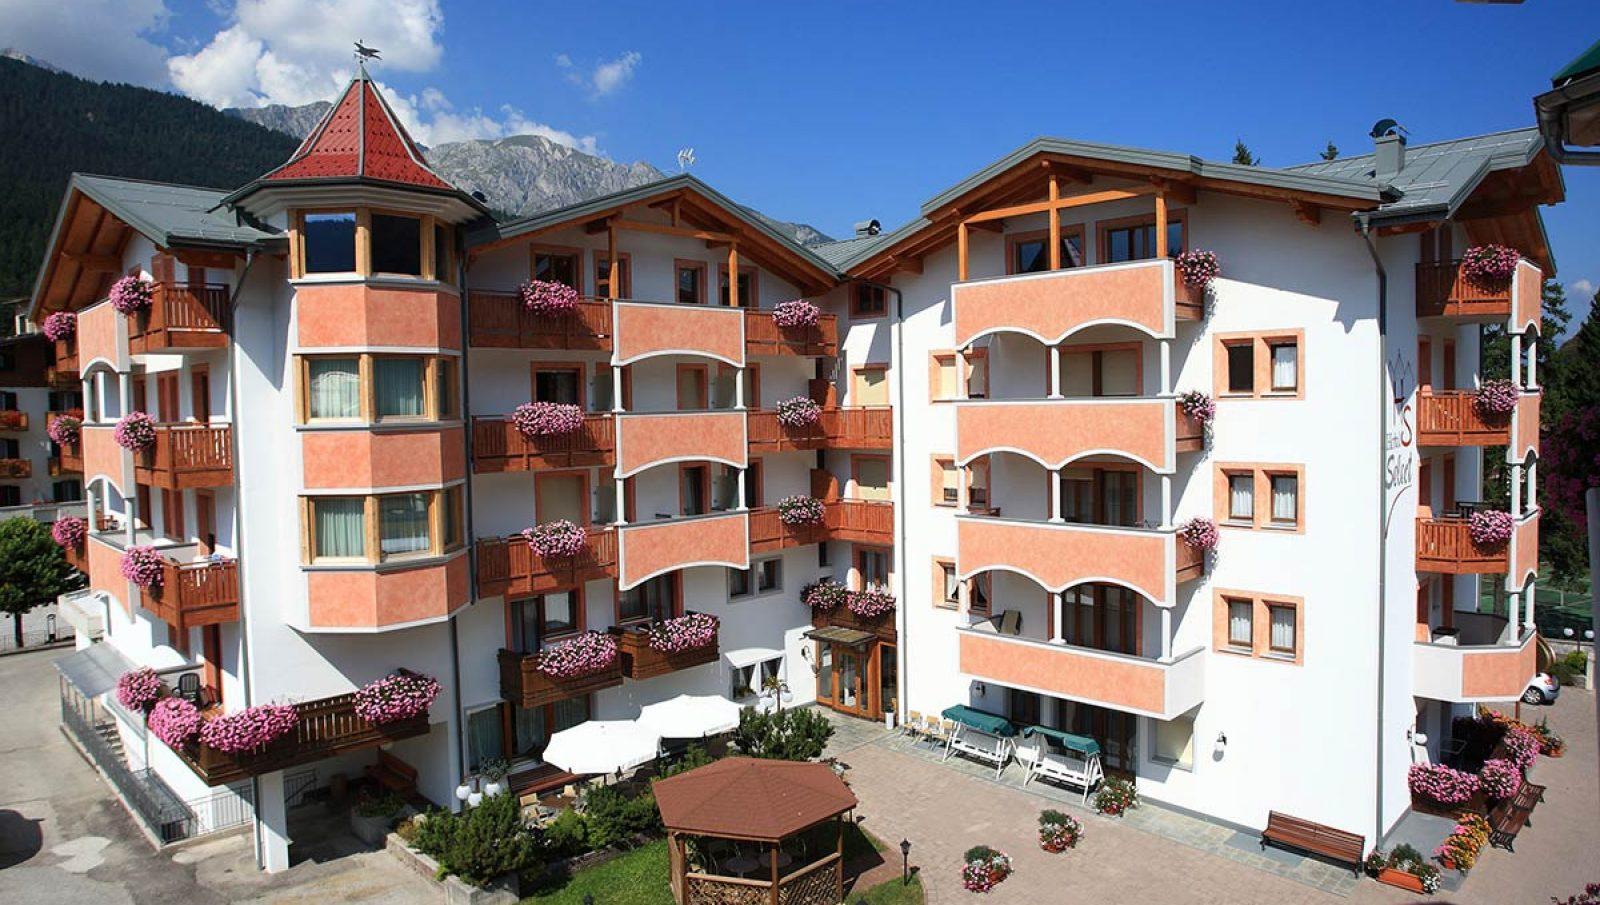 Hotel Select ad Andalo